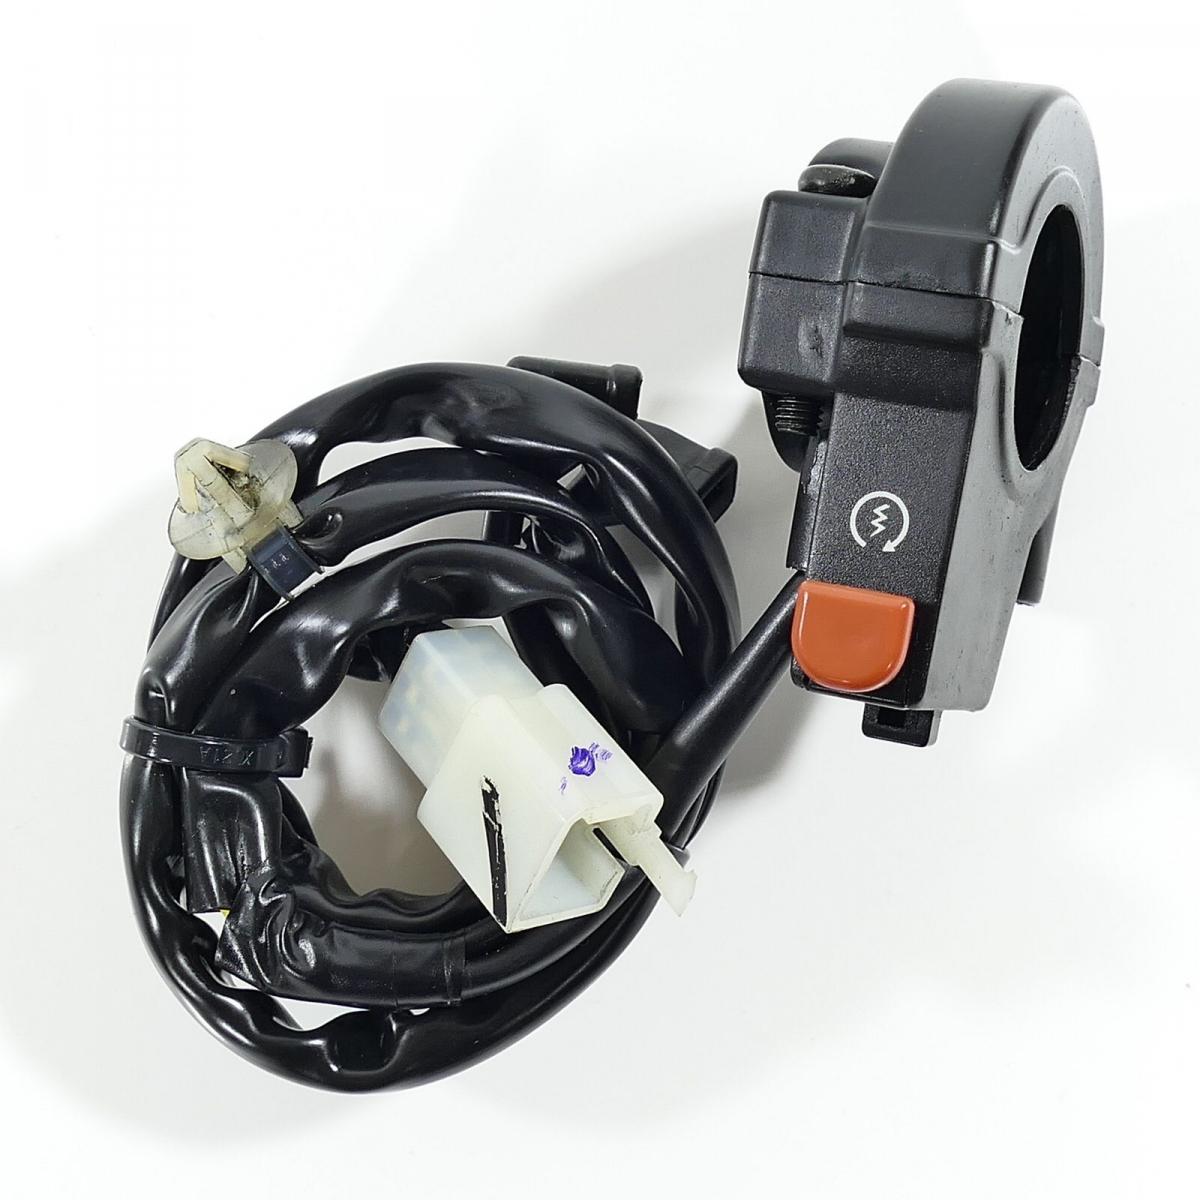 honda cbr125 cbr125r jc39 lenkerschalter schalter bn bikes. Black Bedroom Furniture Sets. Home Design Ideas